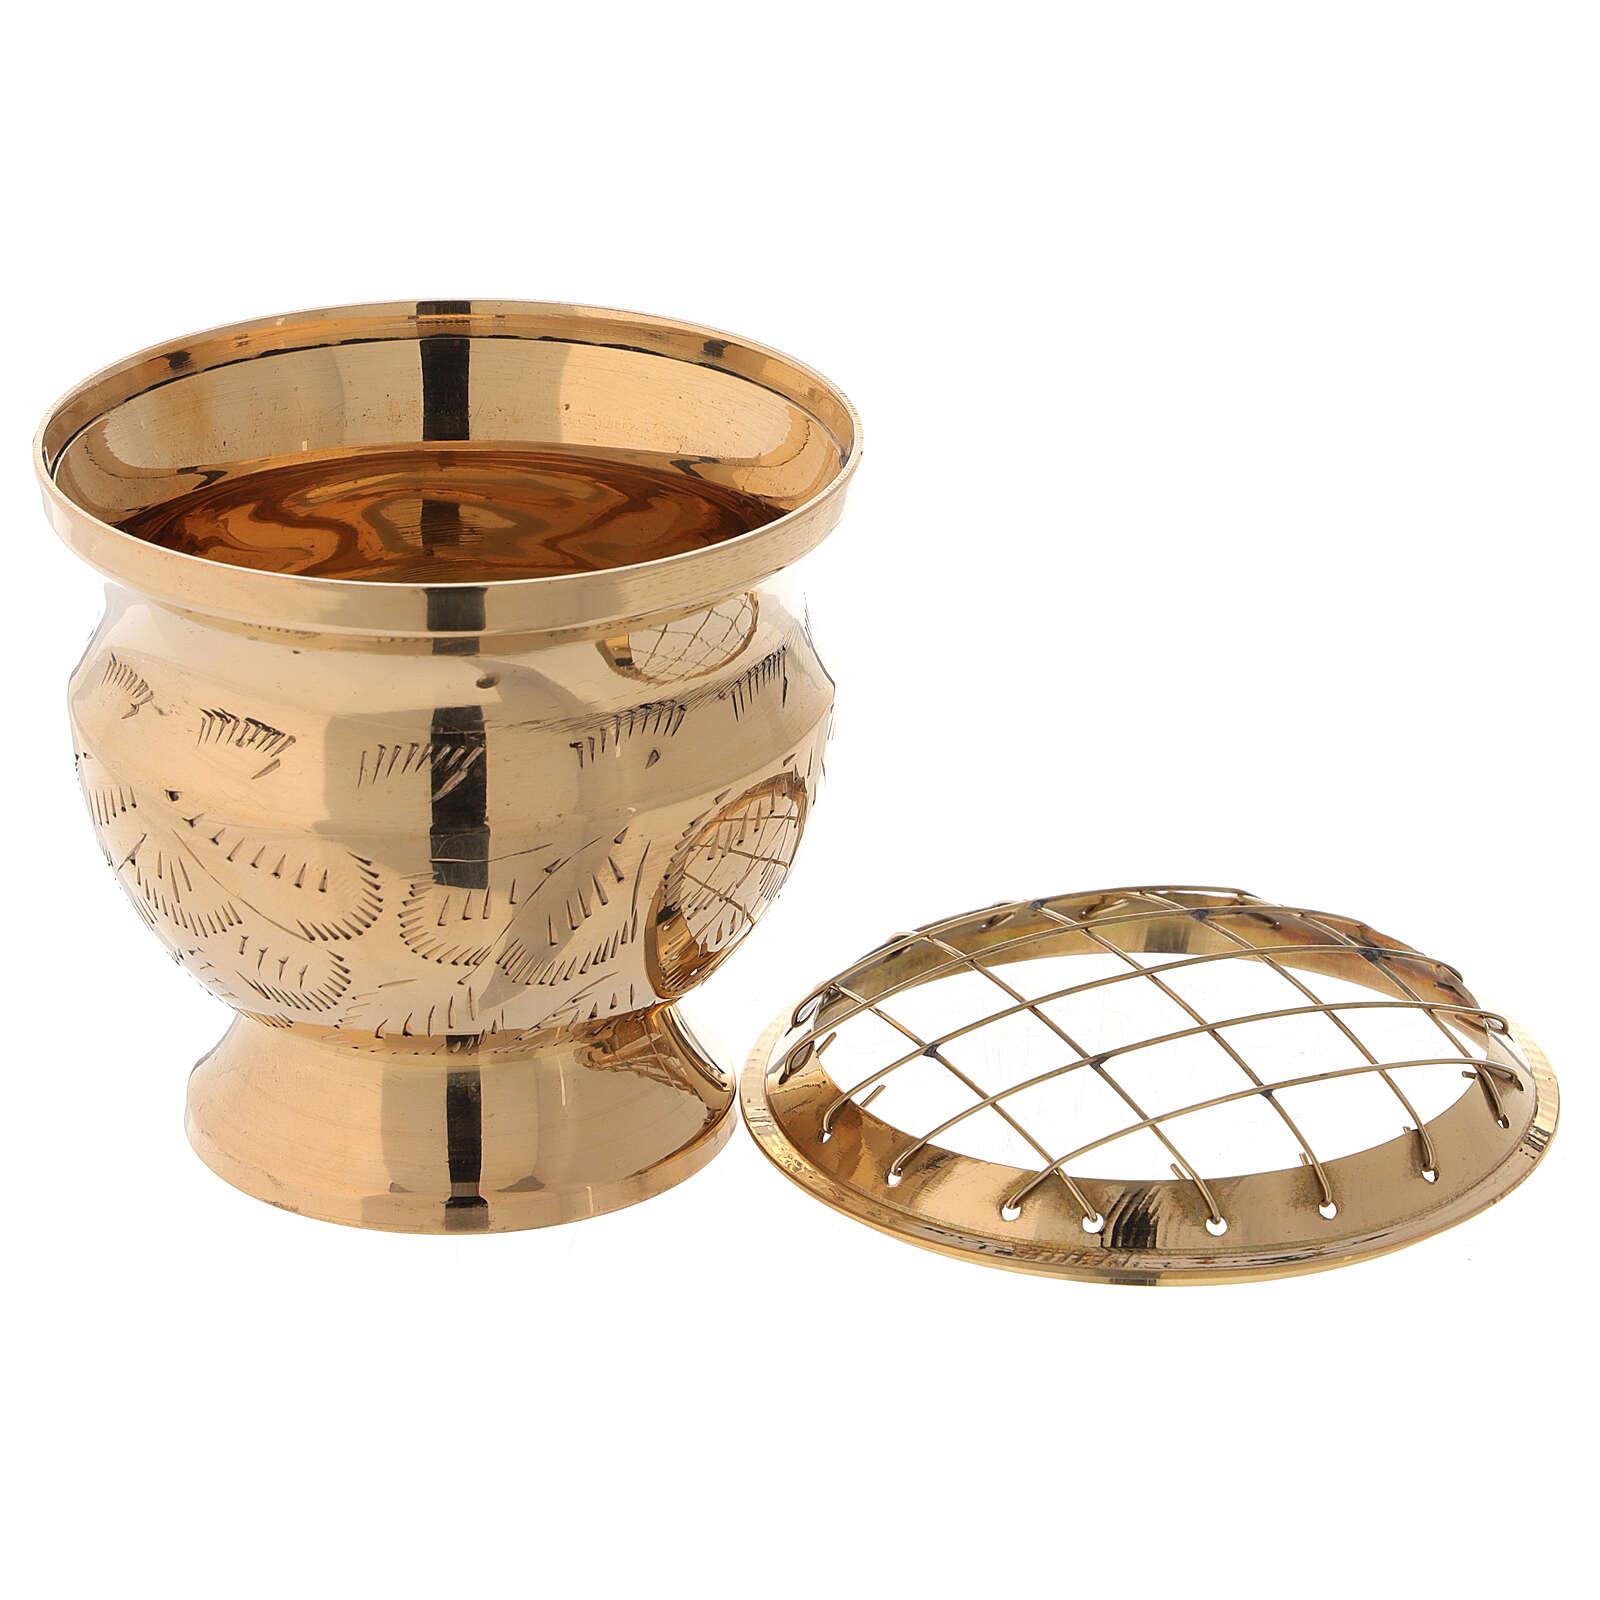 Incense burner with net diameter 3 in 3